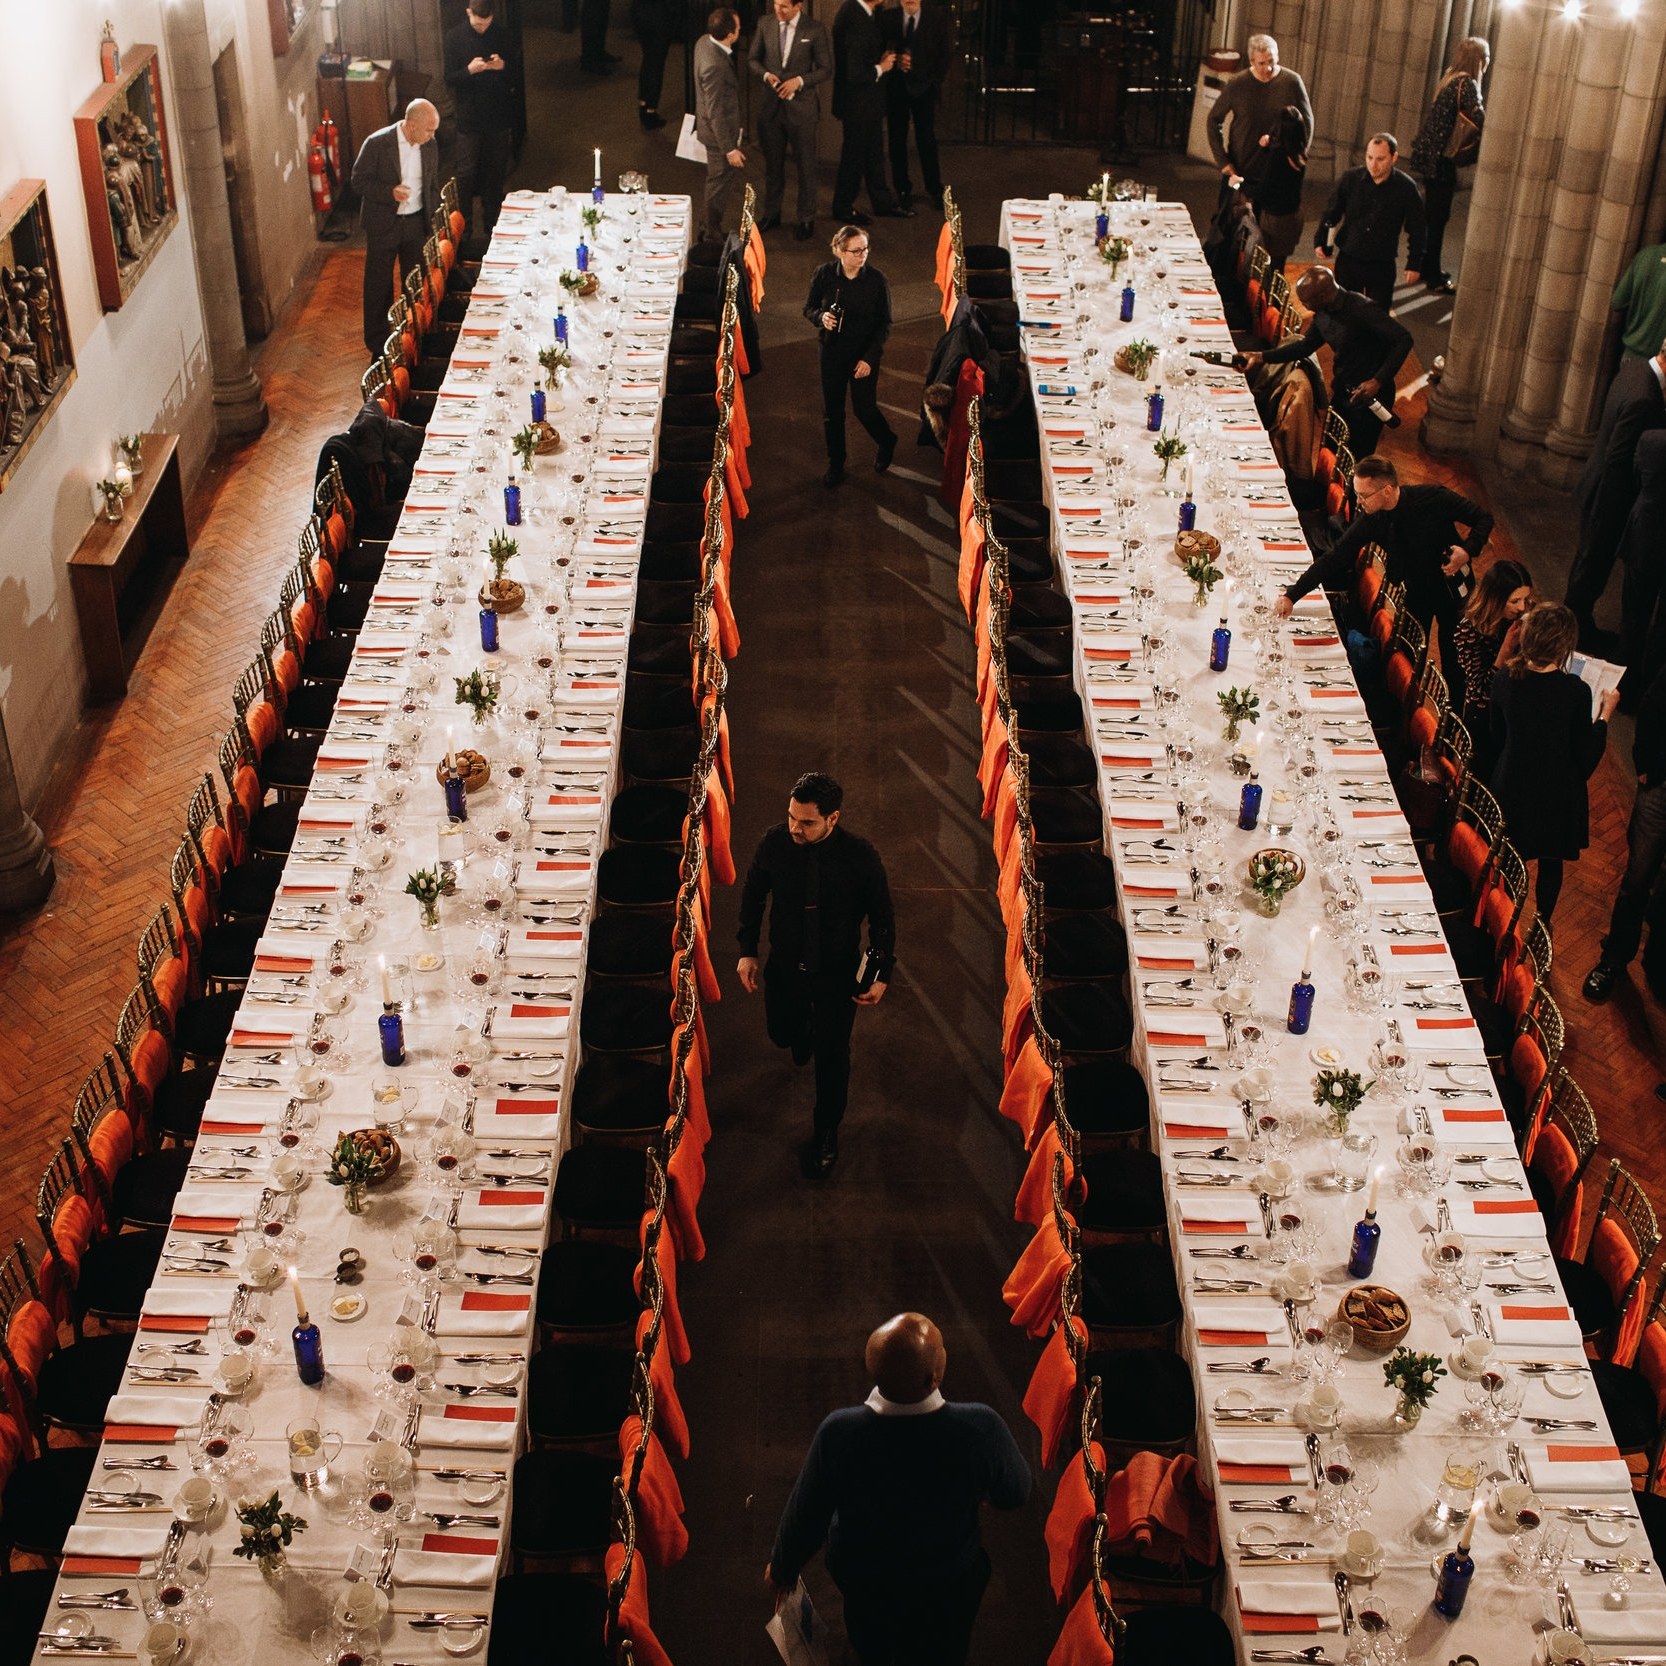 Marylebone_Food_Festival-081.jpg